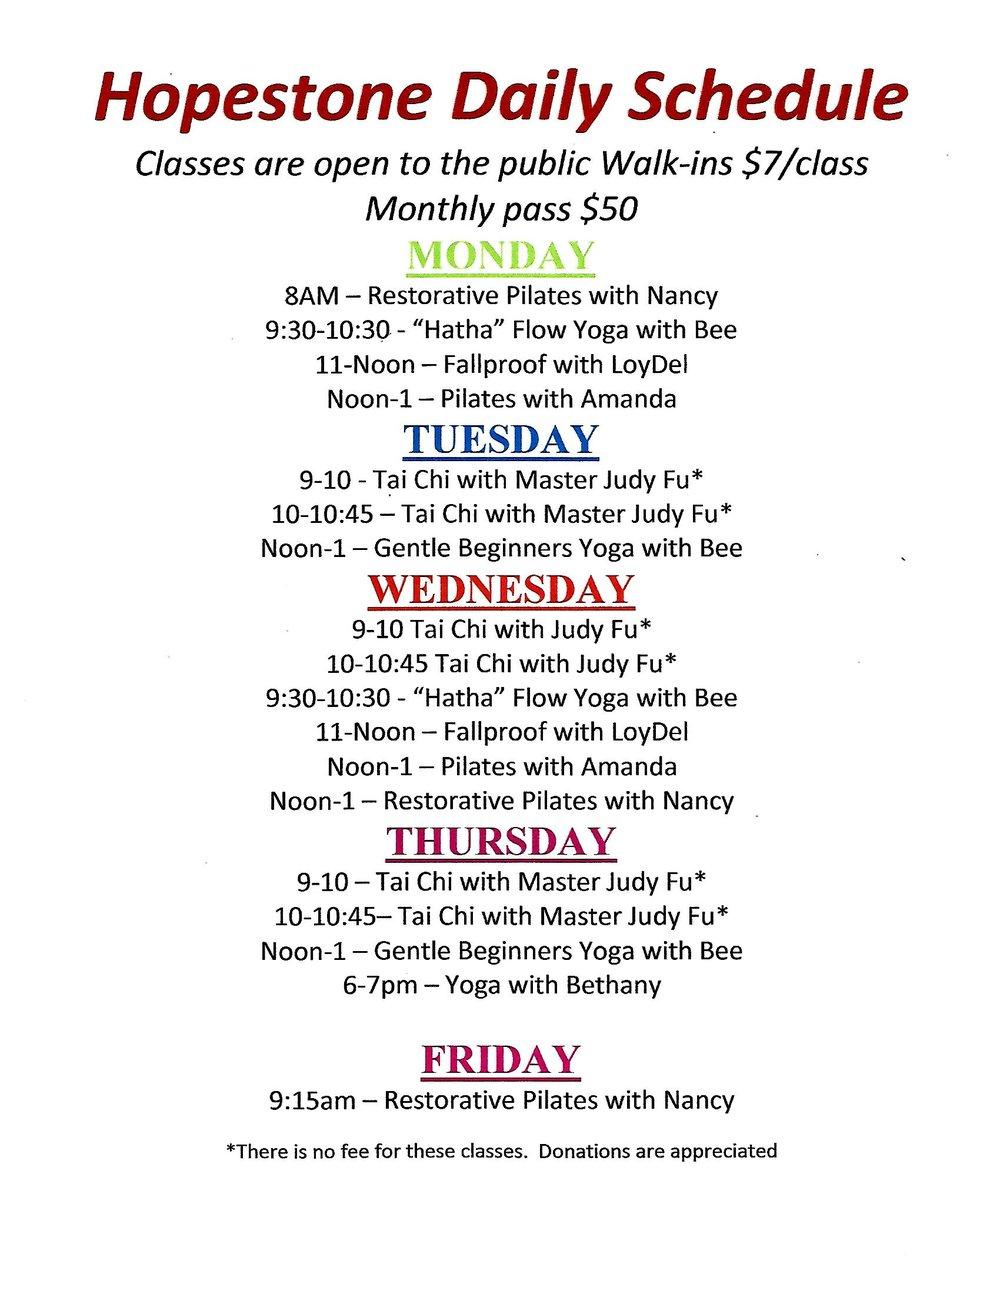 Hopestone Daily Schedule.jpg